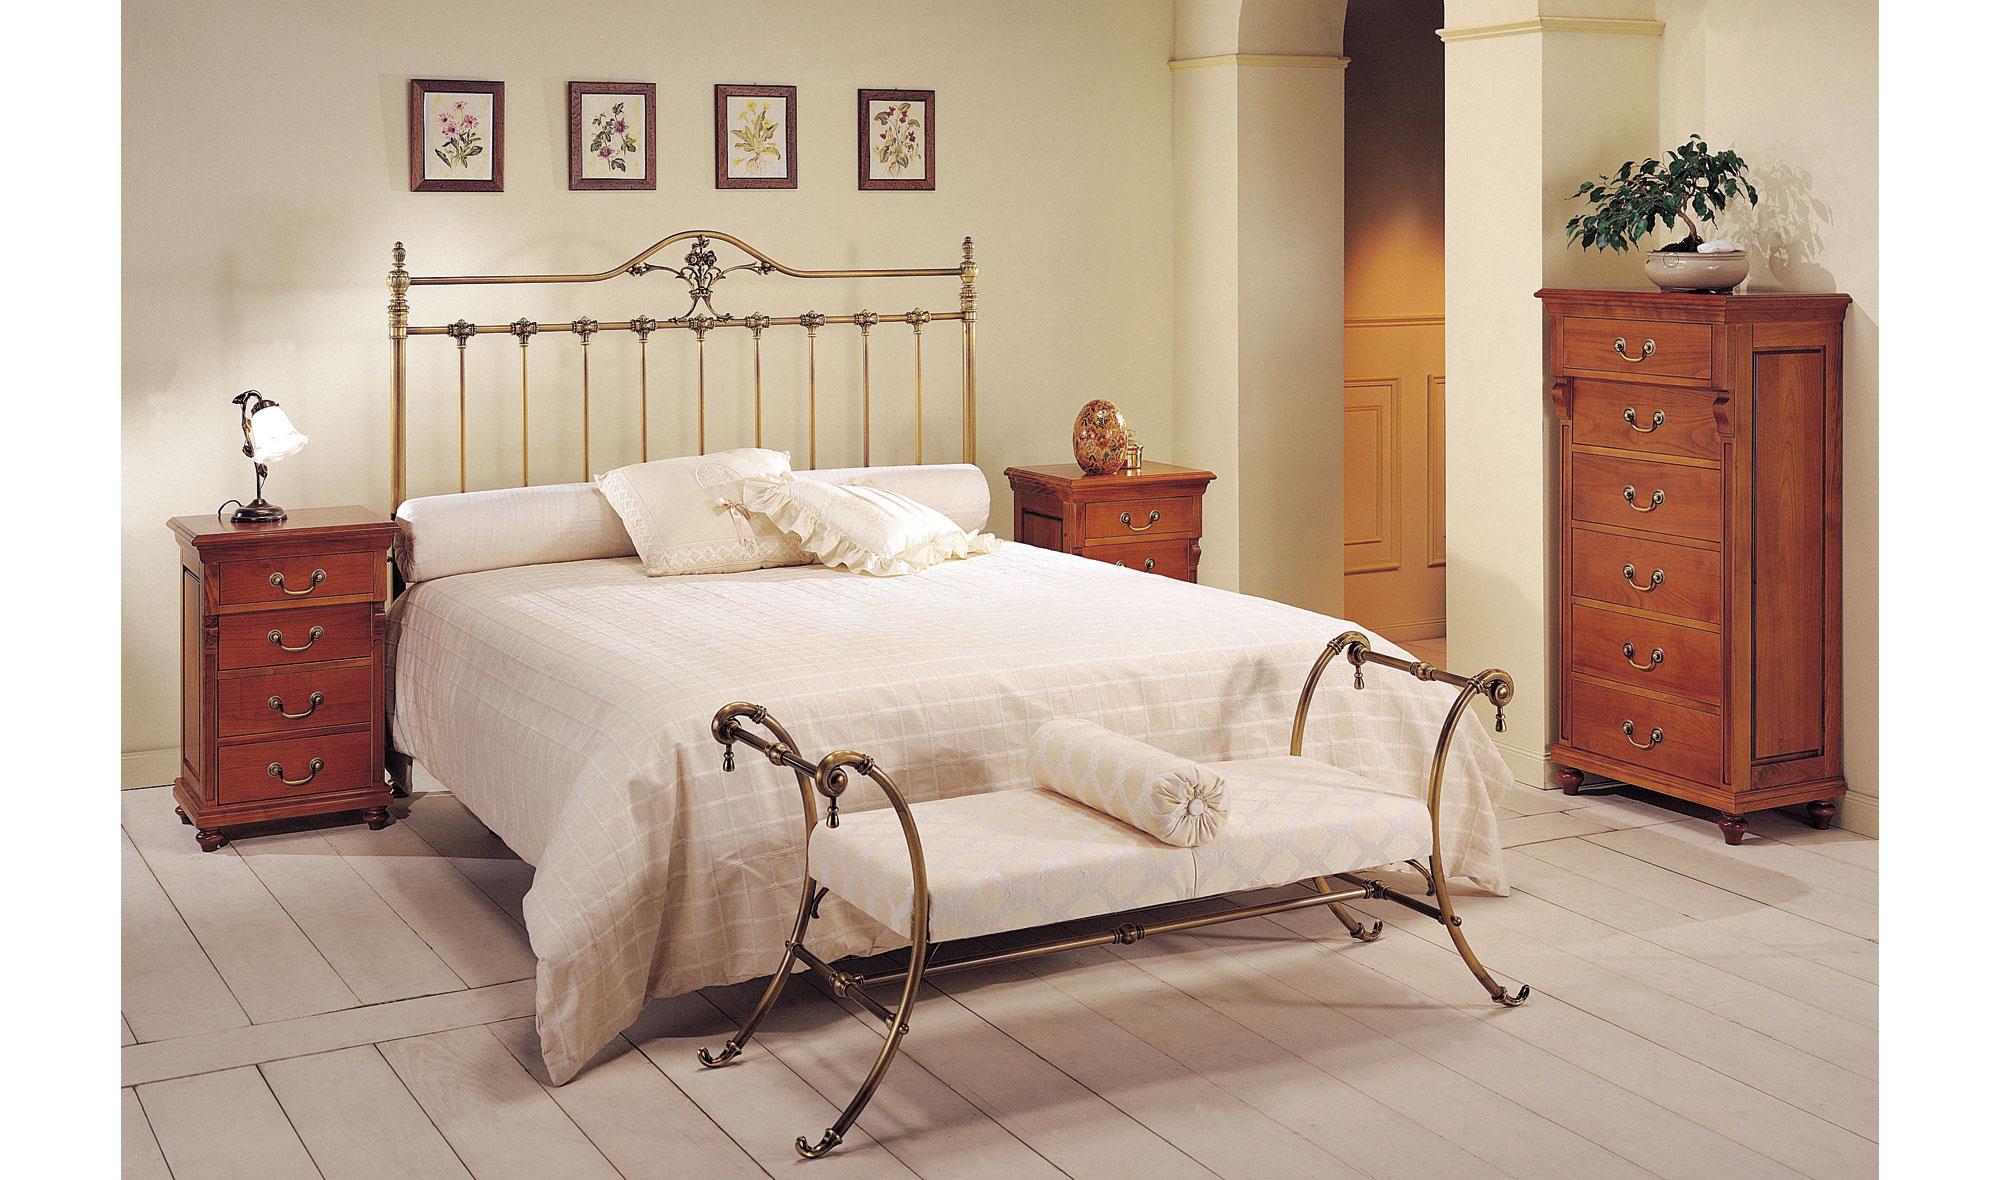 Dormitorio forja Viridiana en Portobellostreet